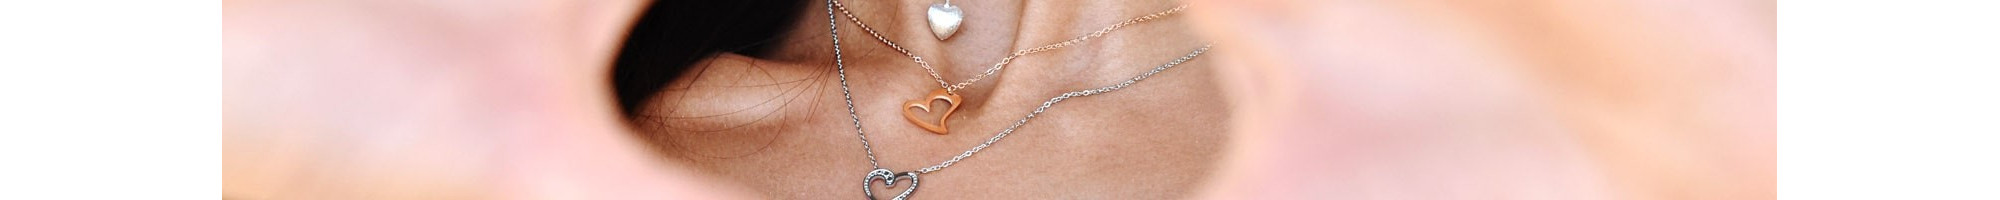 Heart Necklace | Cute & romantic designs online at BIJOU BOX